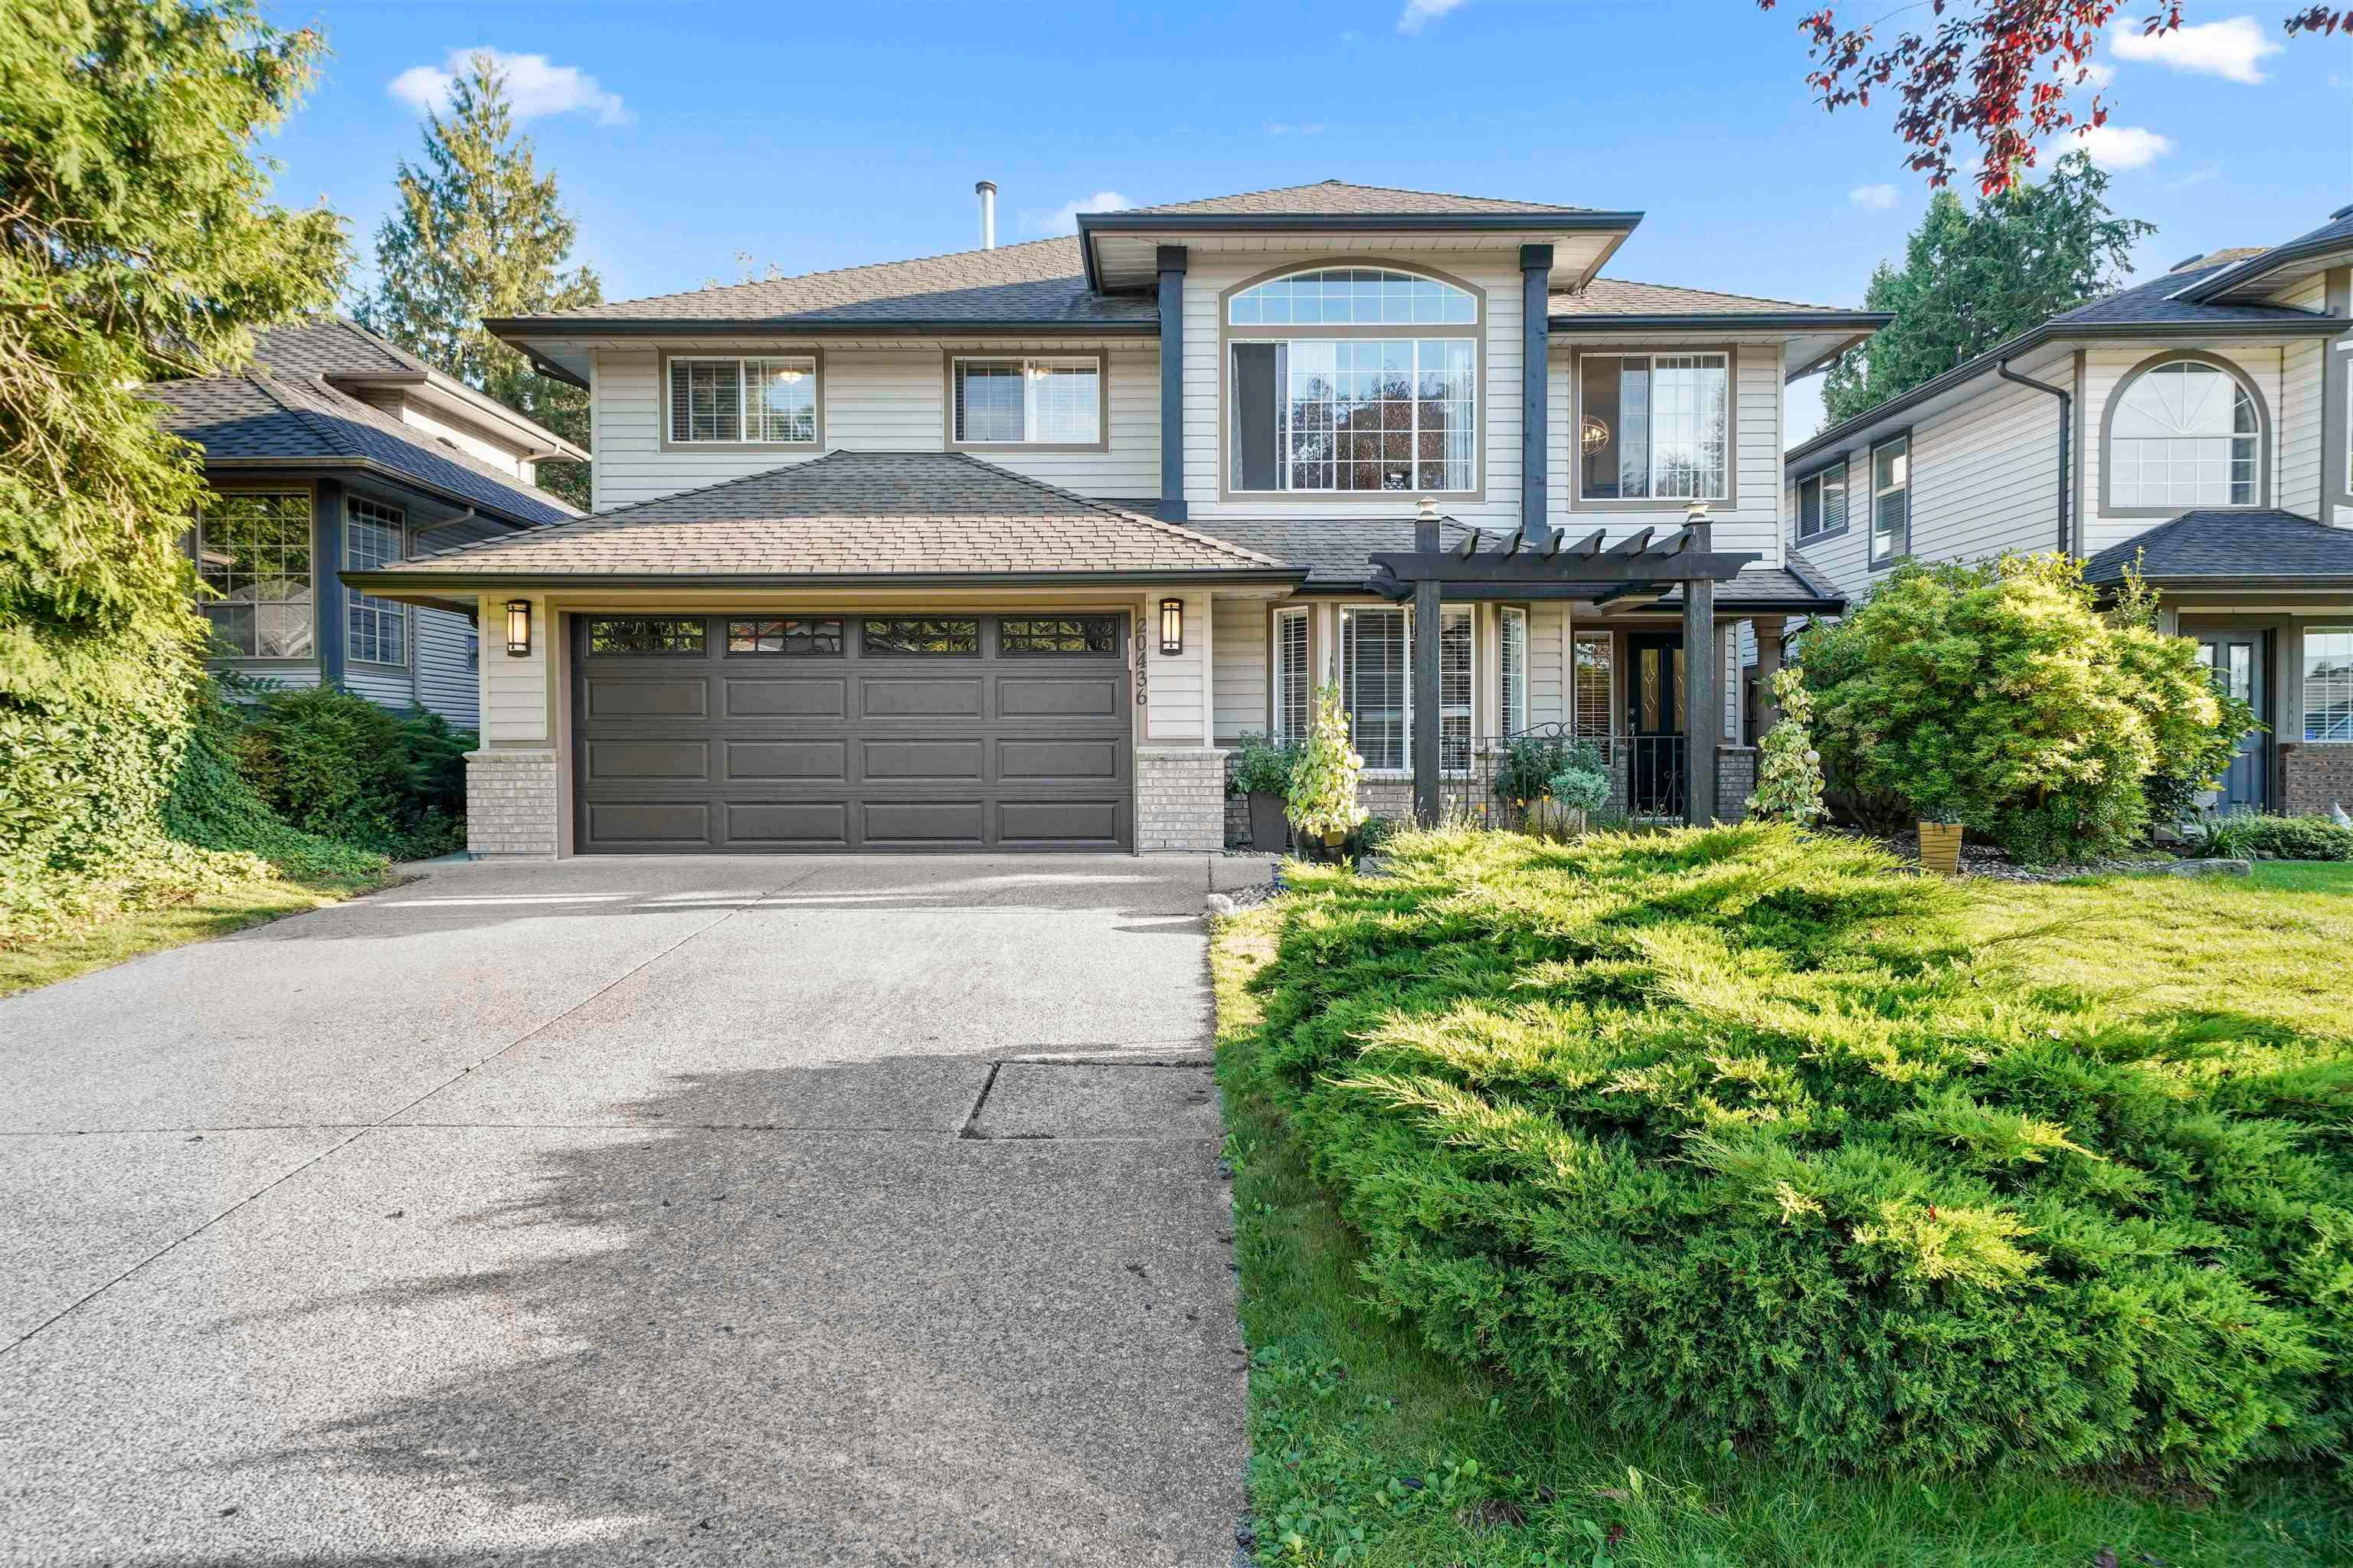 Main Photo: 20436 122B Avenue in Maple Ridge: Northwest Maple Ridge House for sale : MLS®# R2617976